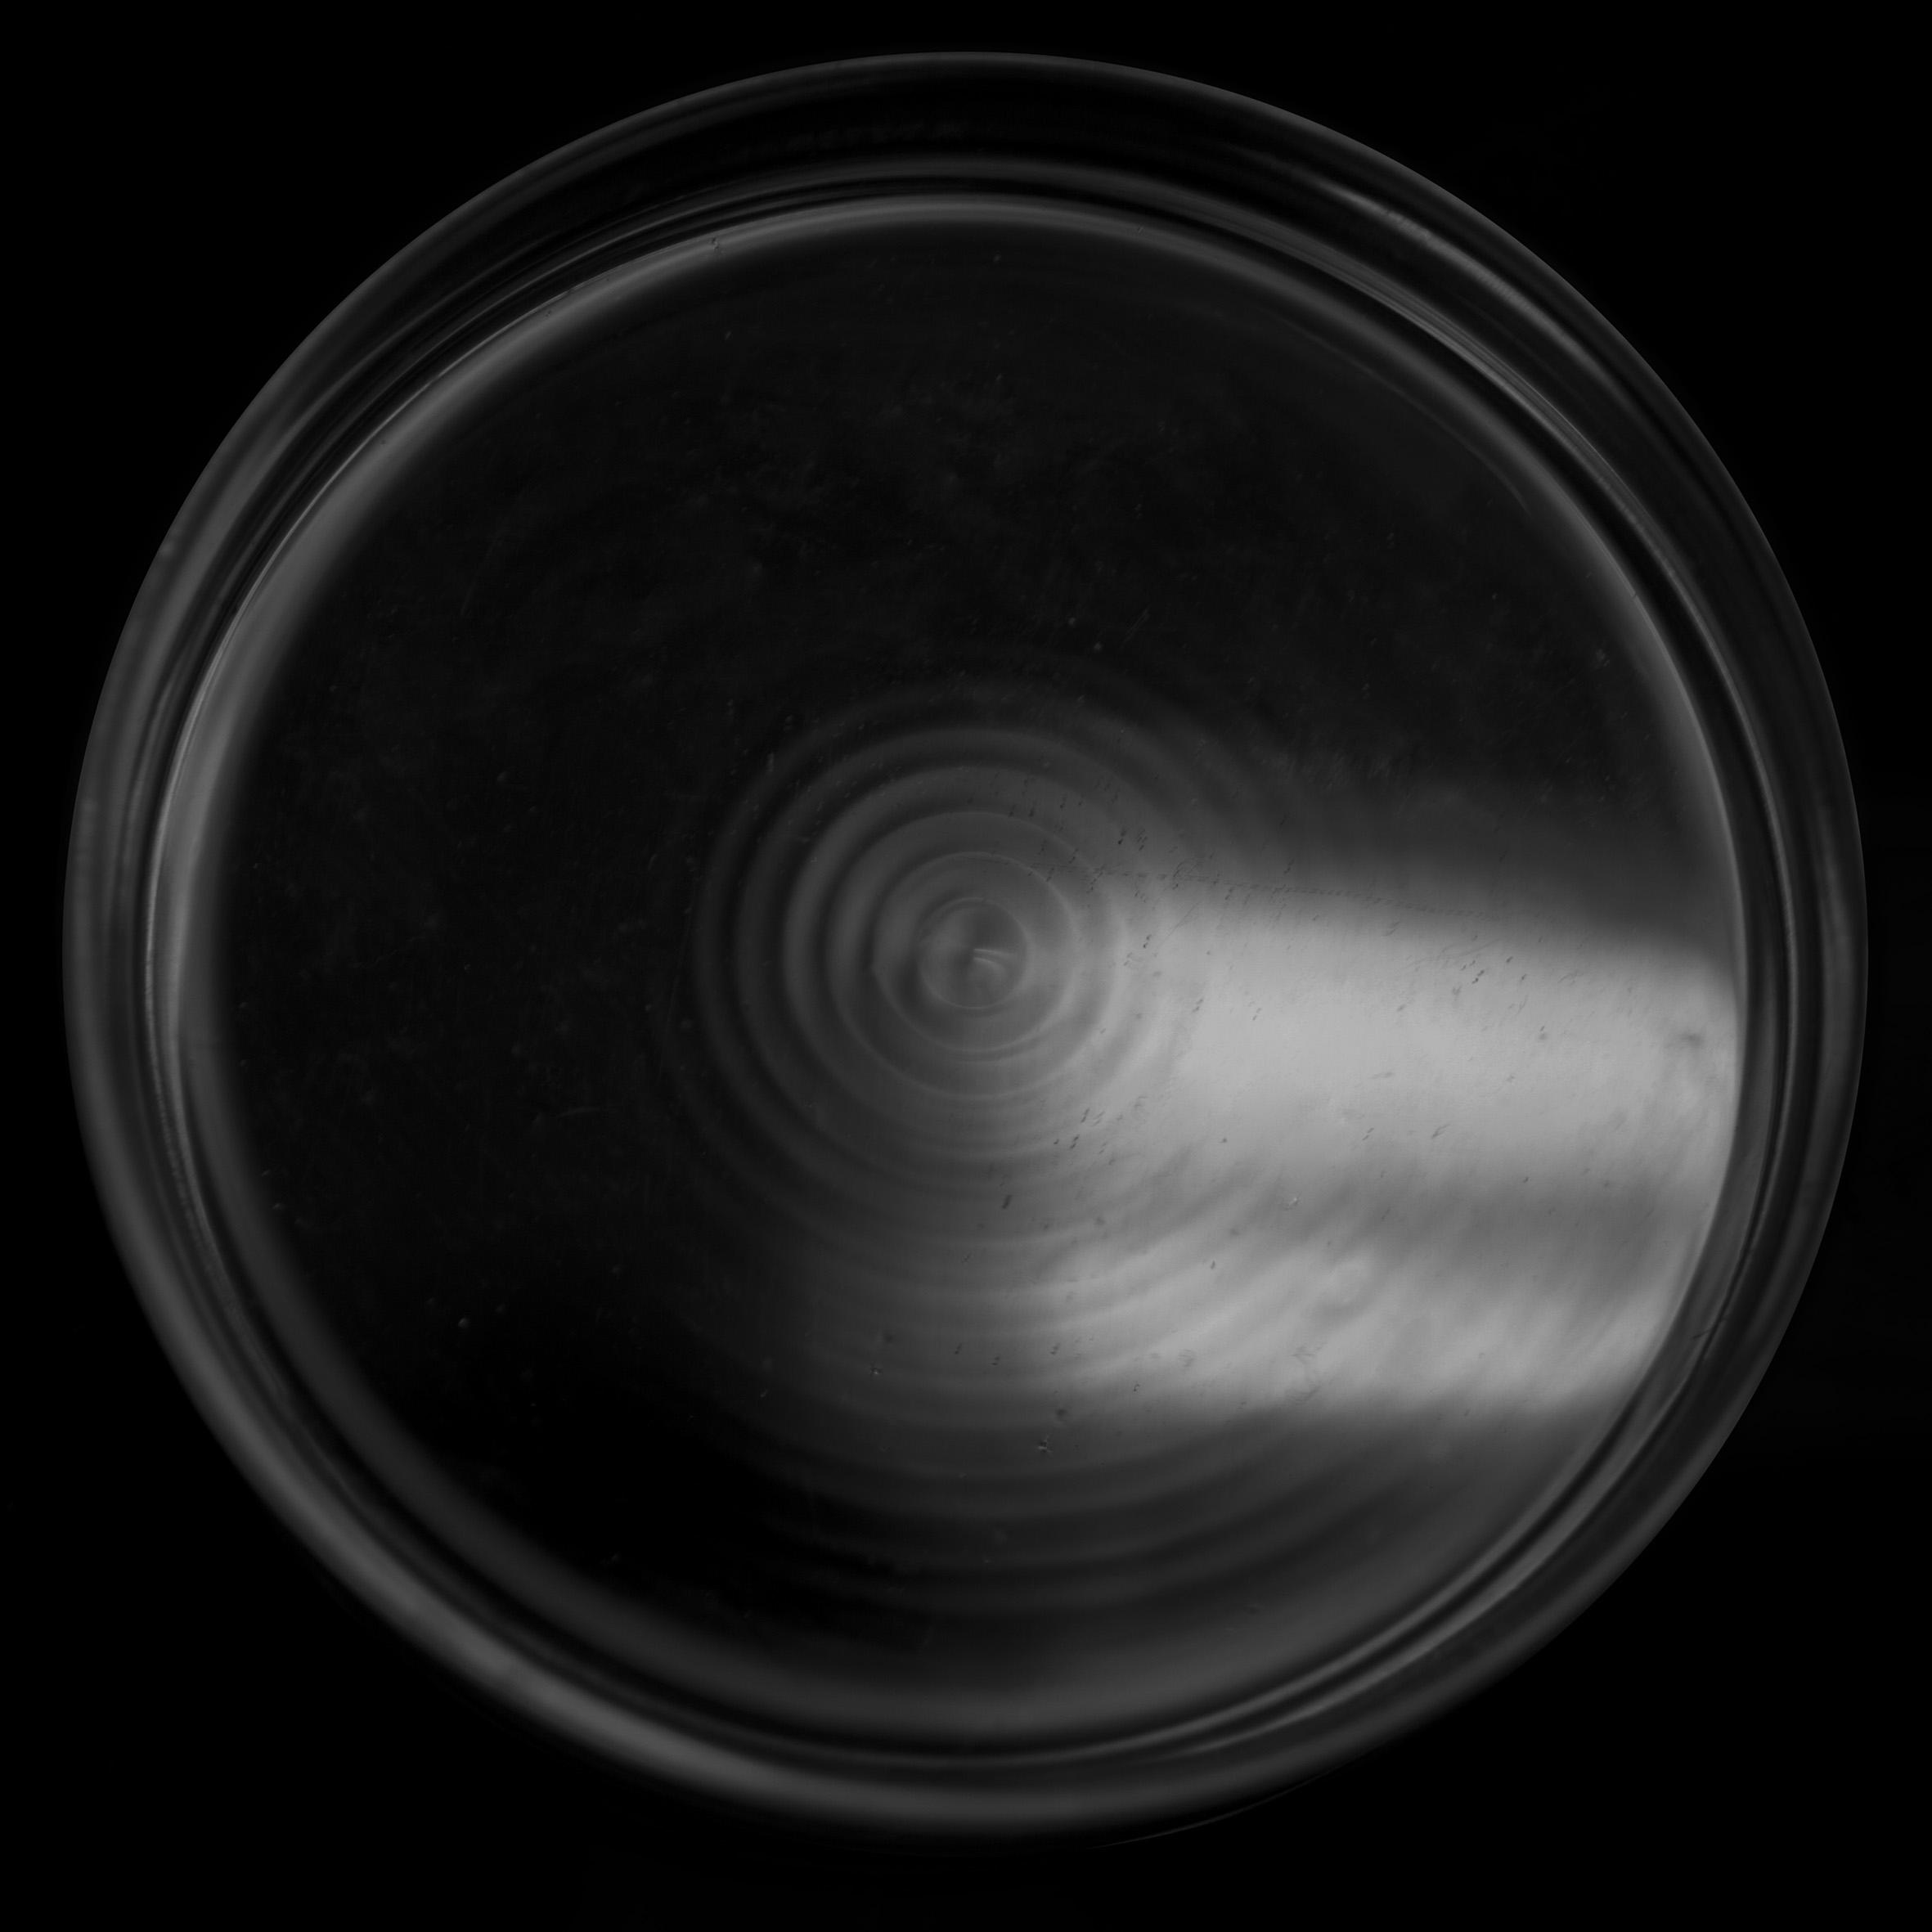 Hz-19. 39Hz Tonoscoop-patroon